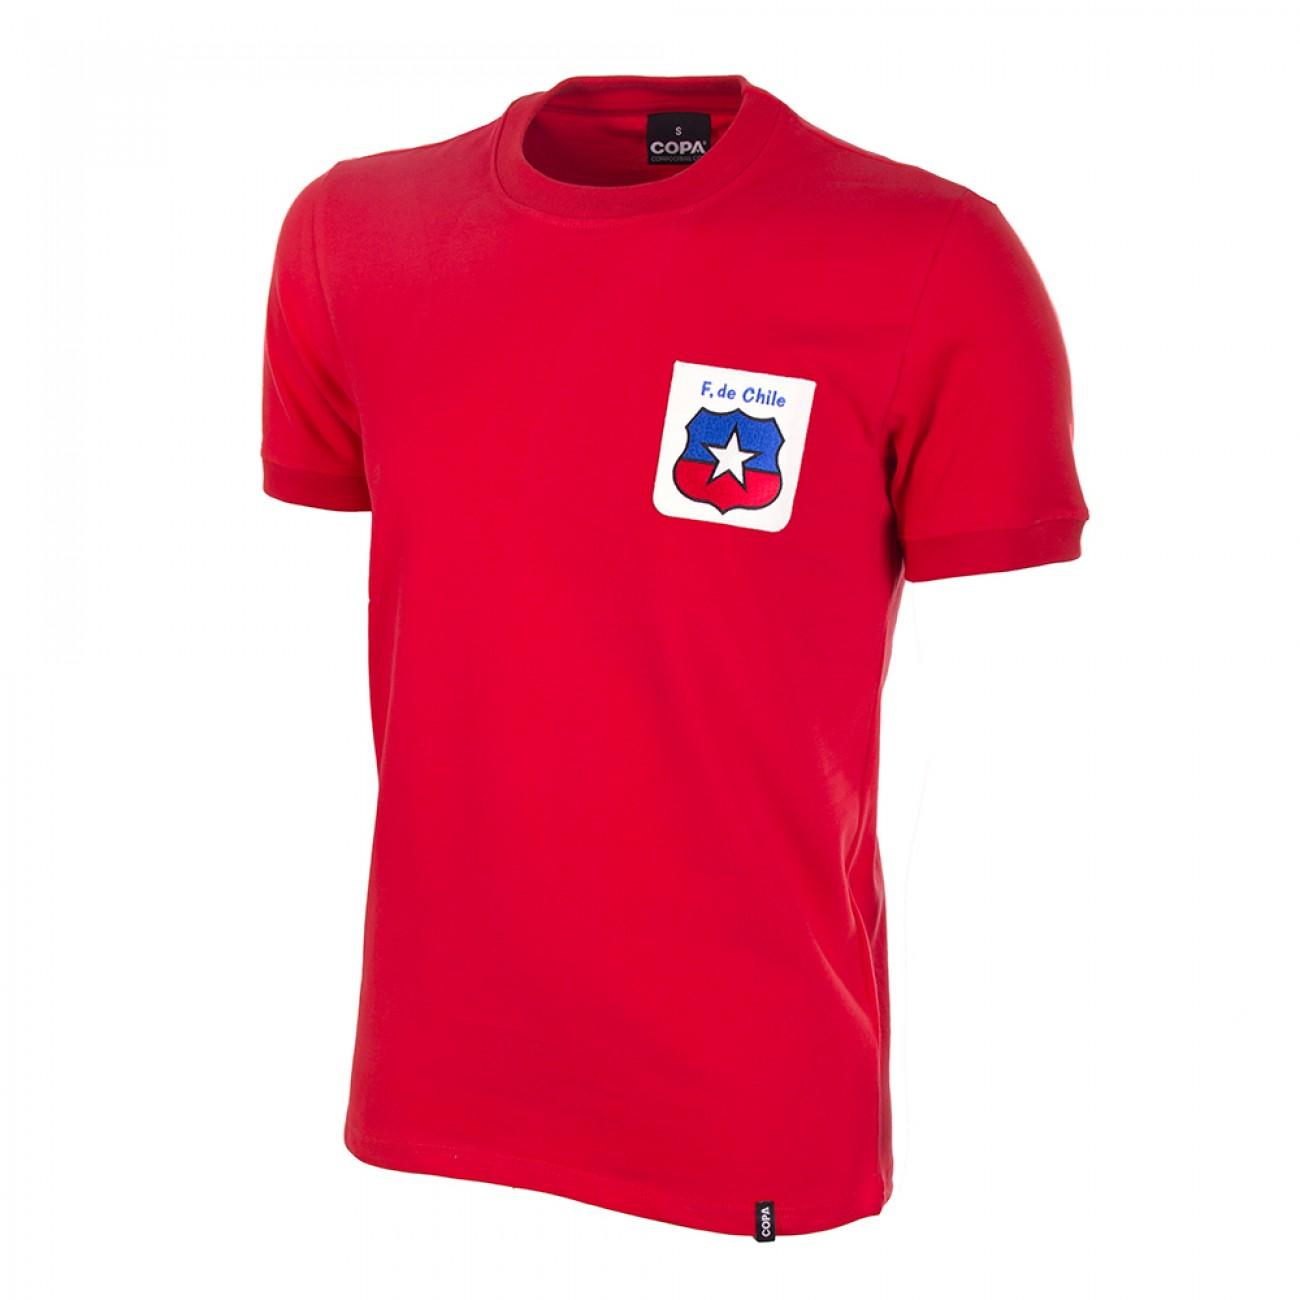 http://www.retrofootball.es/ropa-de-futbol/camiseta-chile-mundial-1974.html